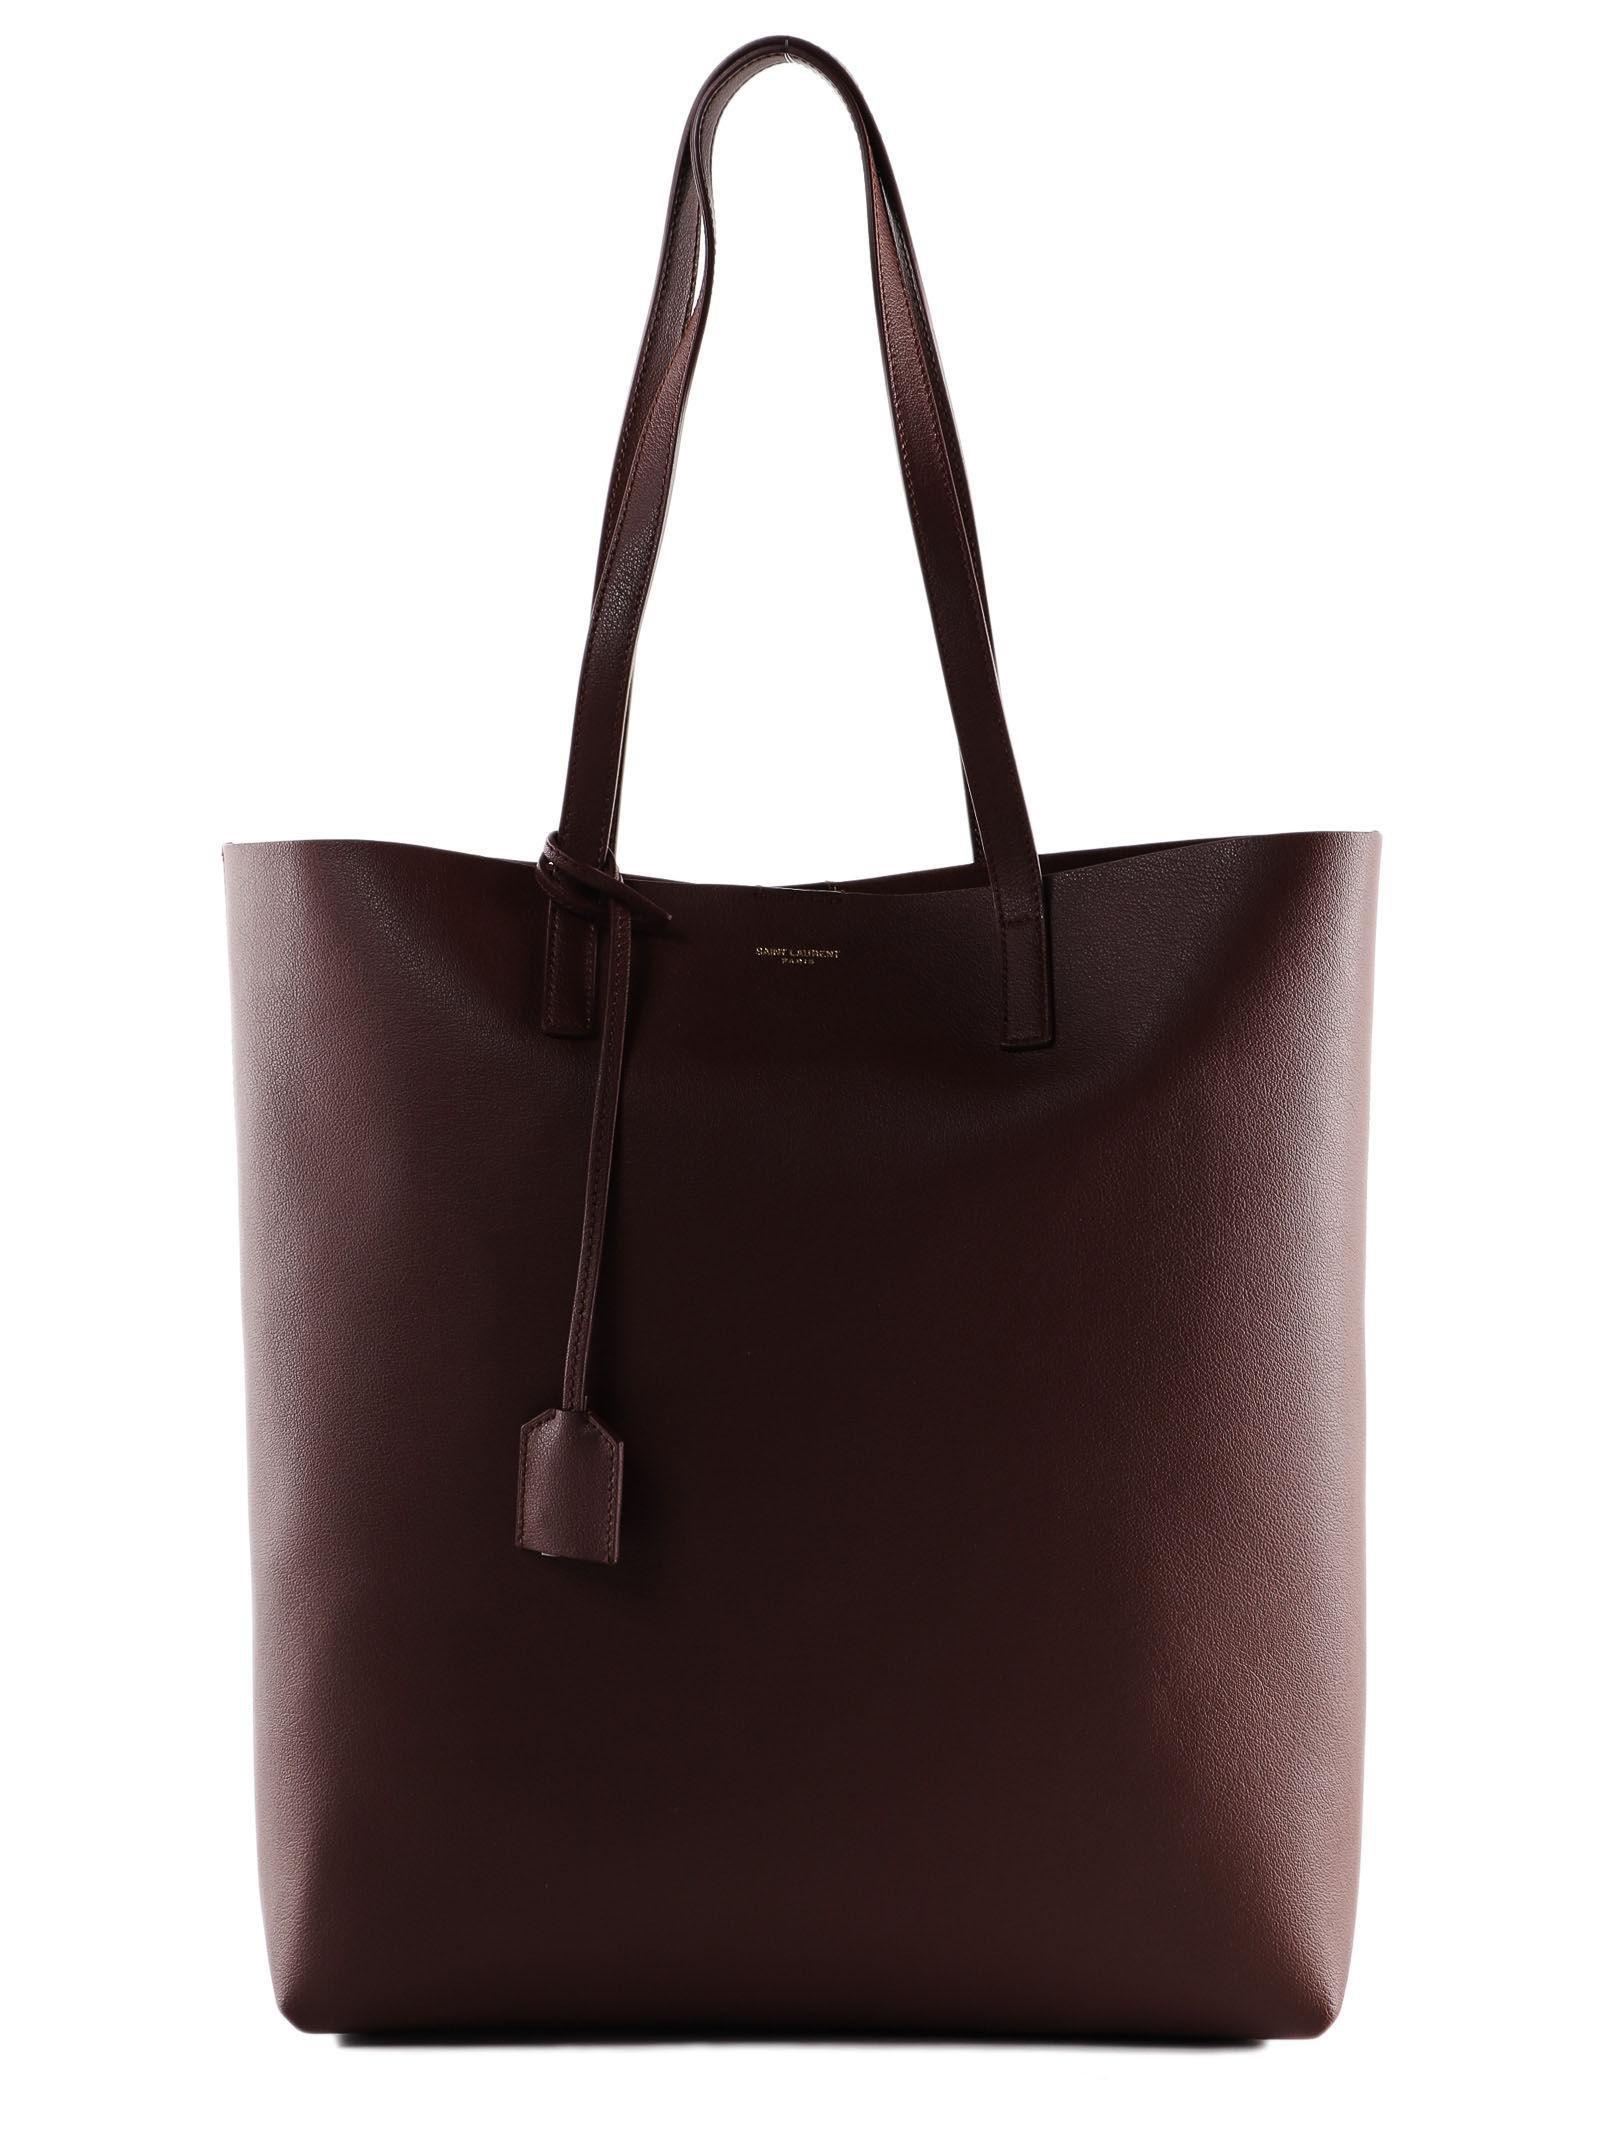 b09727ee6913 Saint Laurent. Women s Shopping Bag